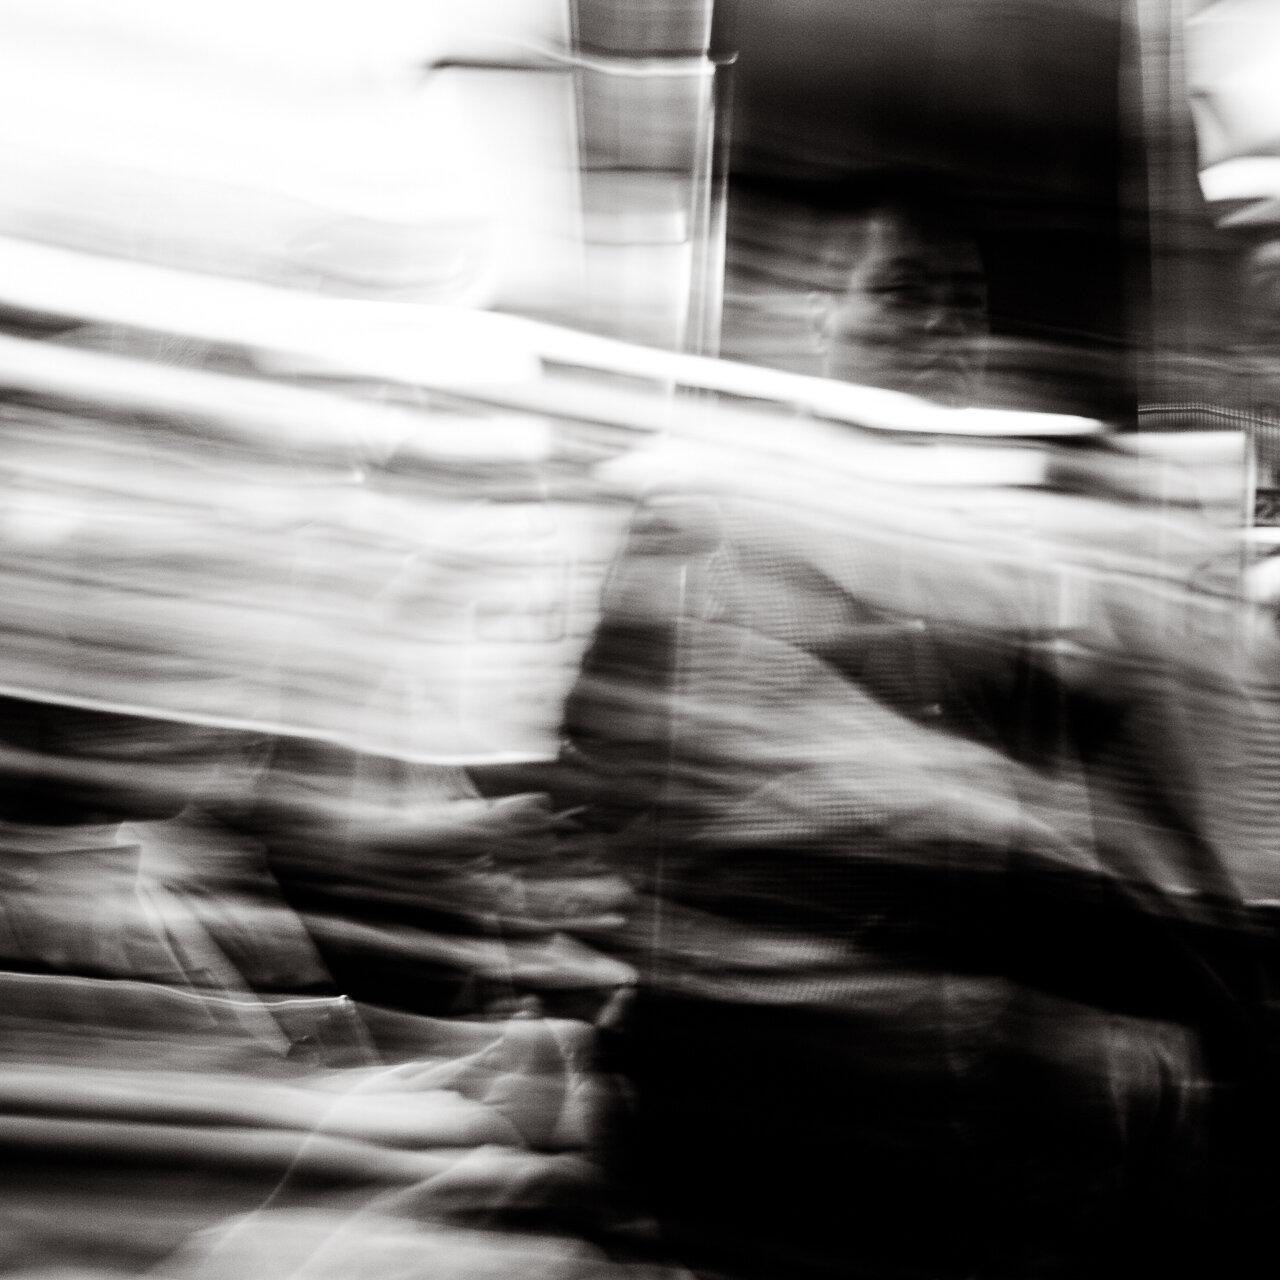 USA, New york, America, Amerika, streetphotography, Straßenfotofotografie, street, Straße, Alltag, everyday life, photo, Foto, photography, Fotografie, people, Menschen - bondarenko-ps_de+00027+_P2M5045.jpg